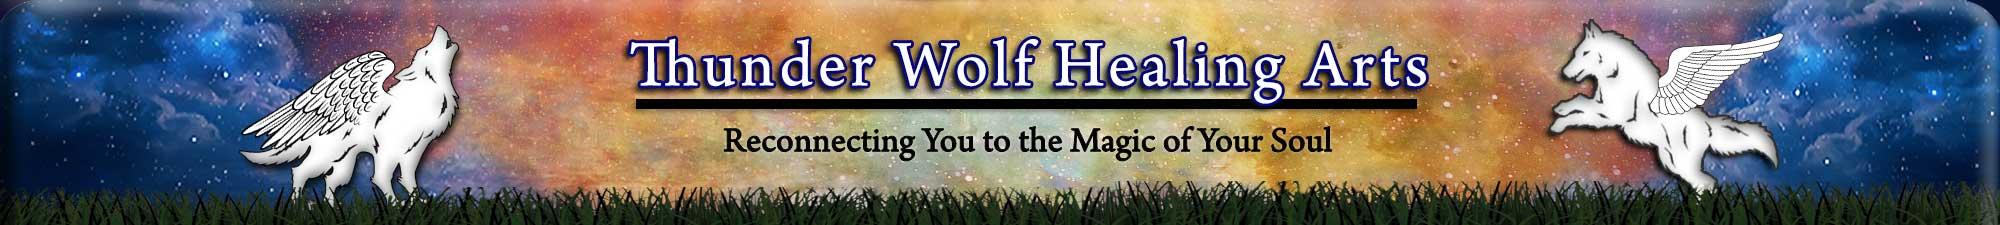 Thunder Wolf Healing Arts Header